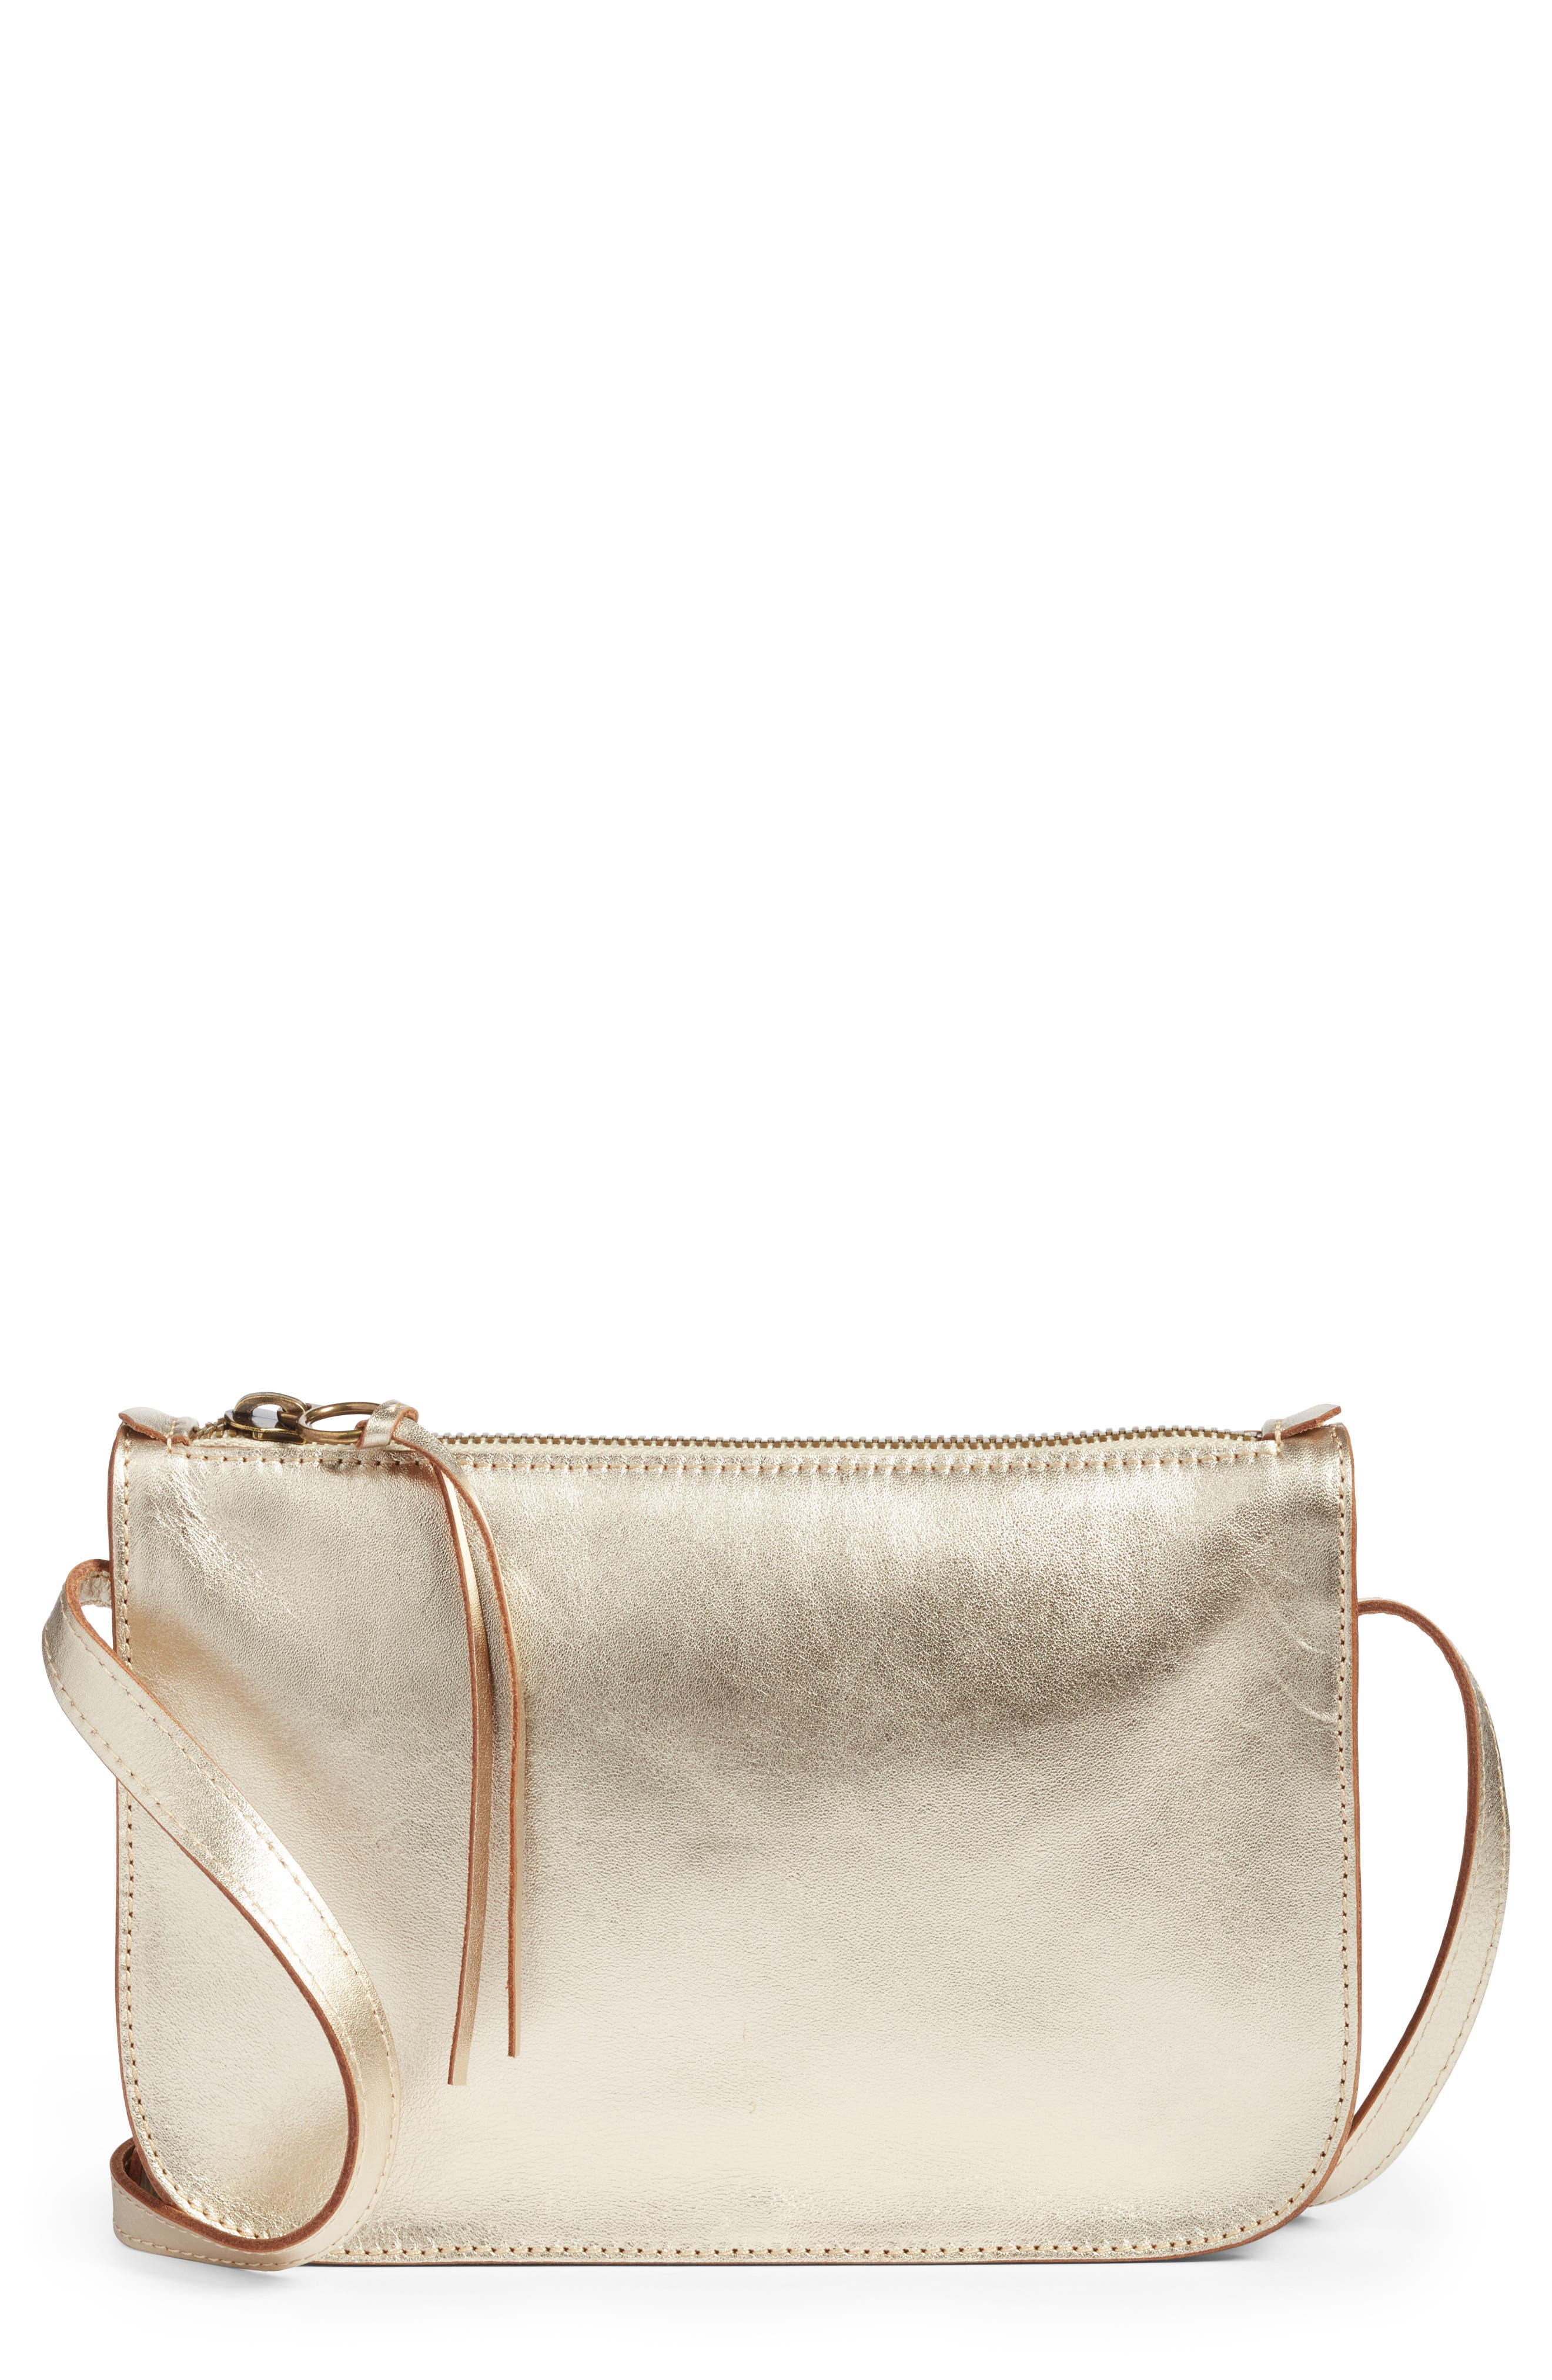 Leather Crossbody Bag,                         Main,                         color, Gold Metallic